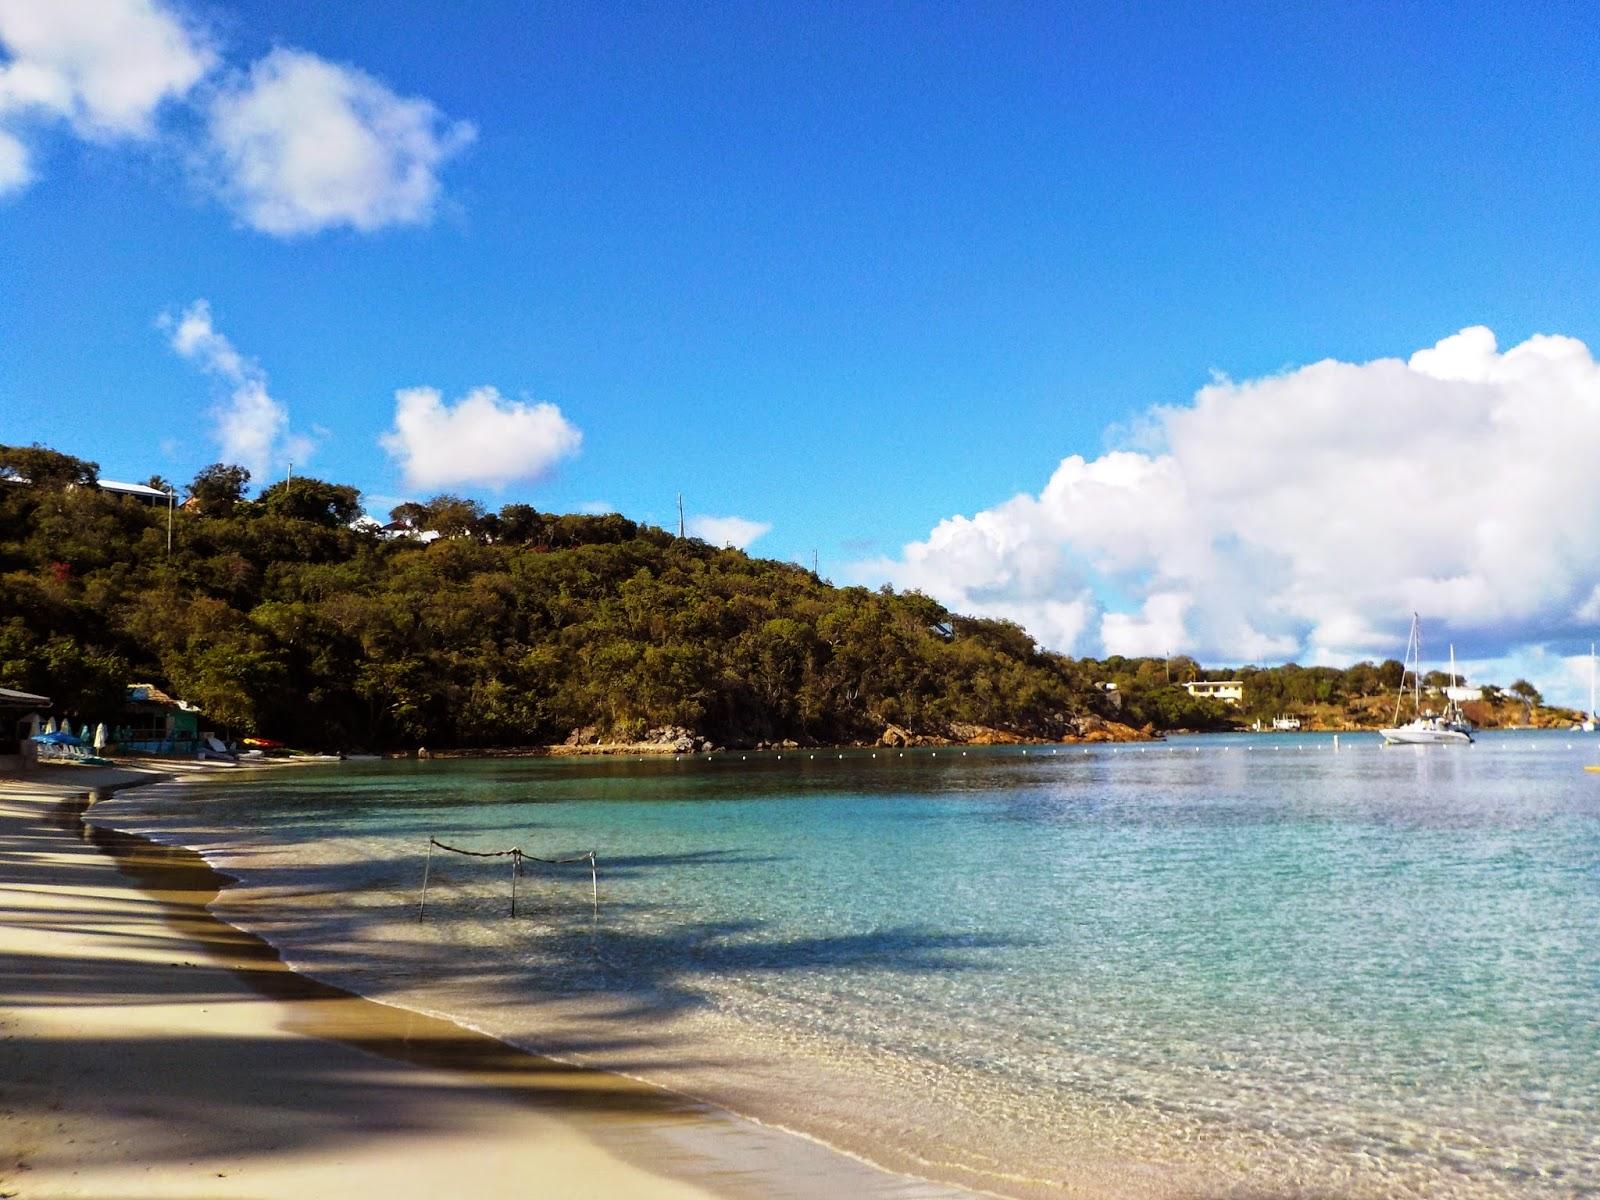 Golf Cart Rental On Water Island Usvi